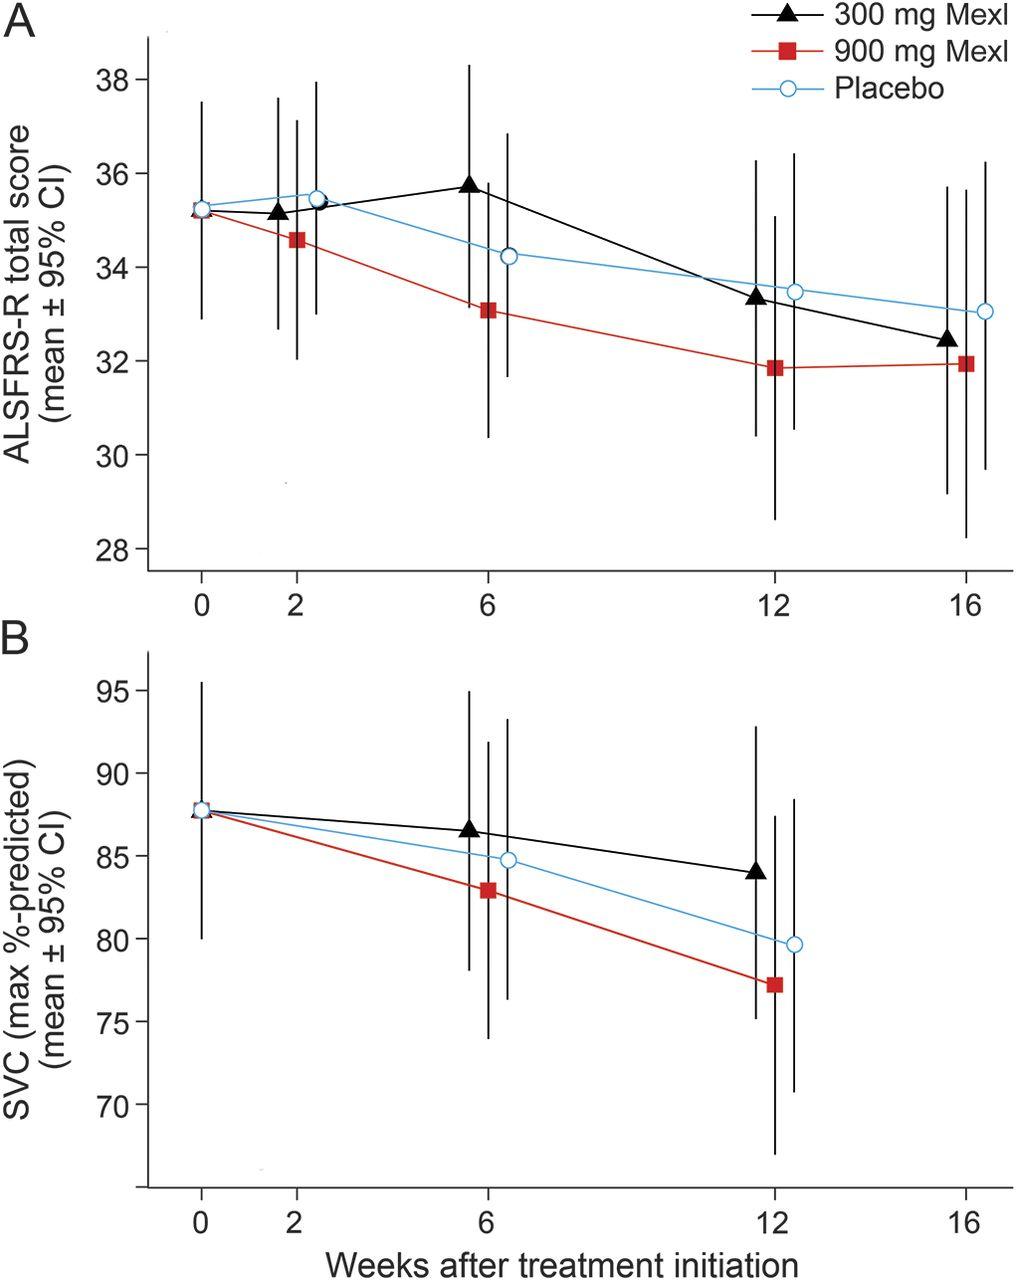 A randomized trial of mexiletine in ALS   Neurology